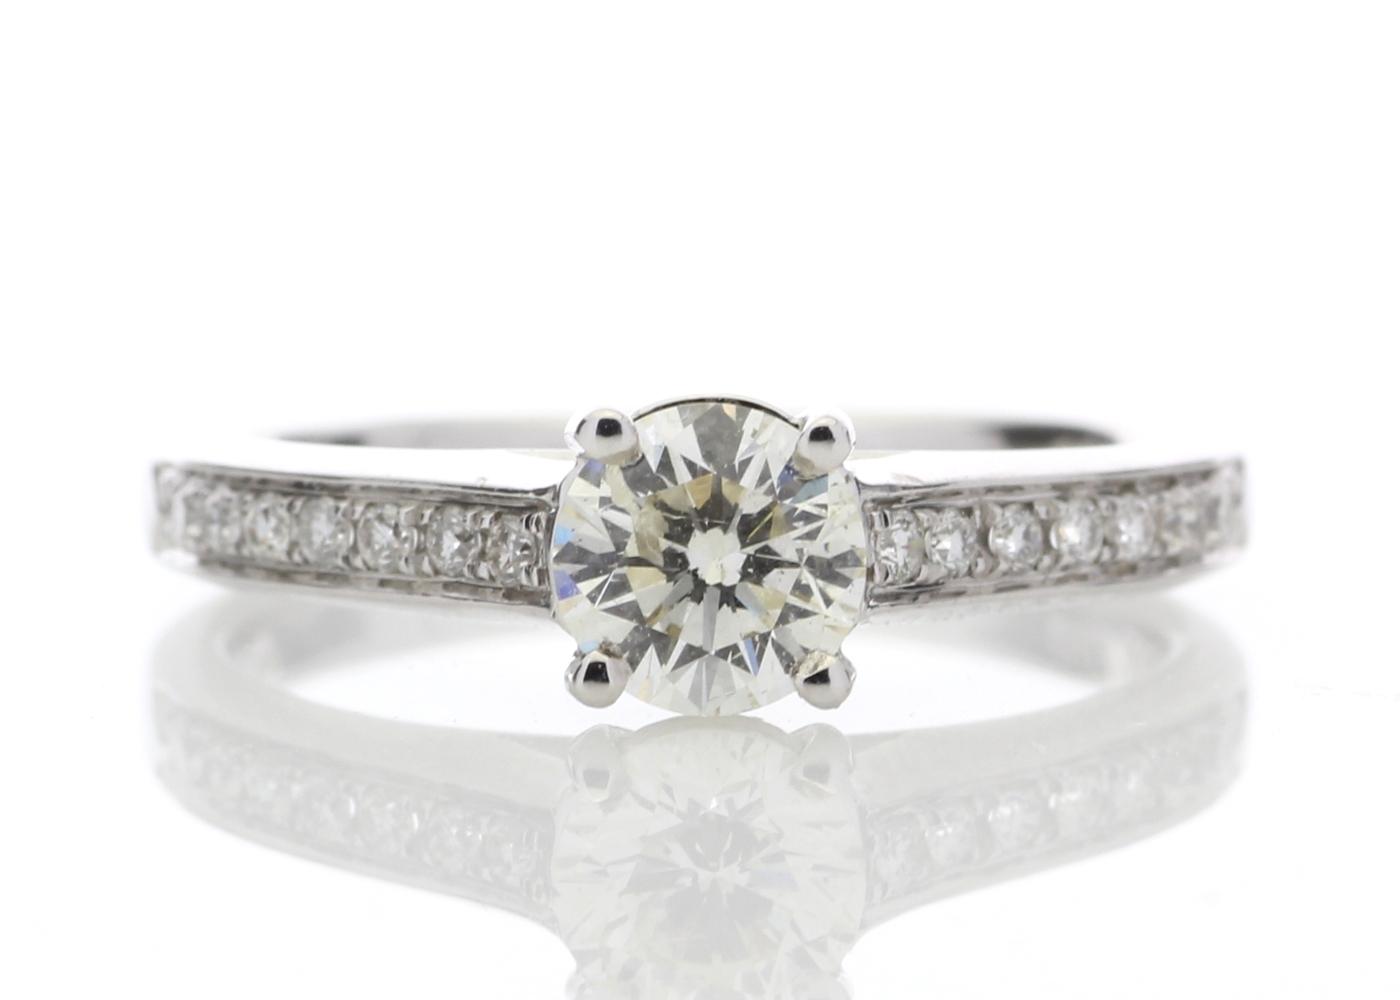 Lot 17 - 18ct White Gold Single Stone Claw Set Diamond Ring 0.73 Carats